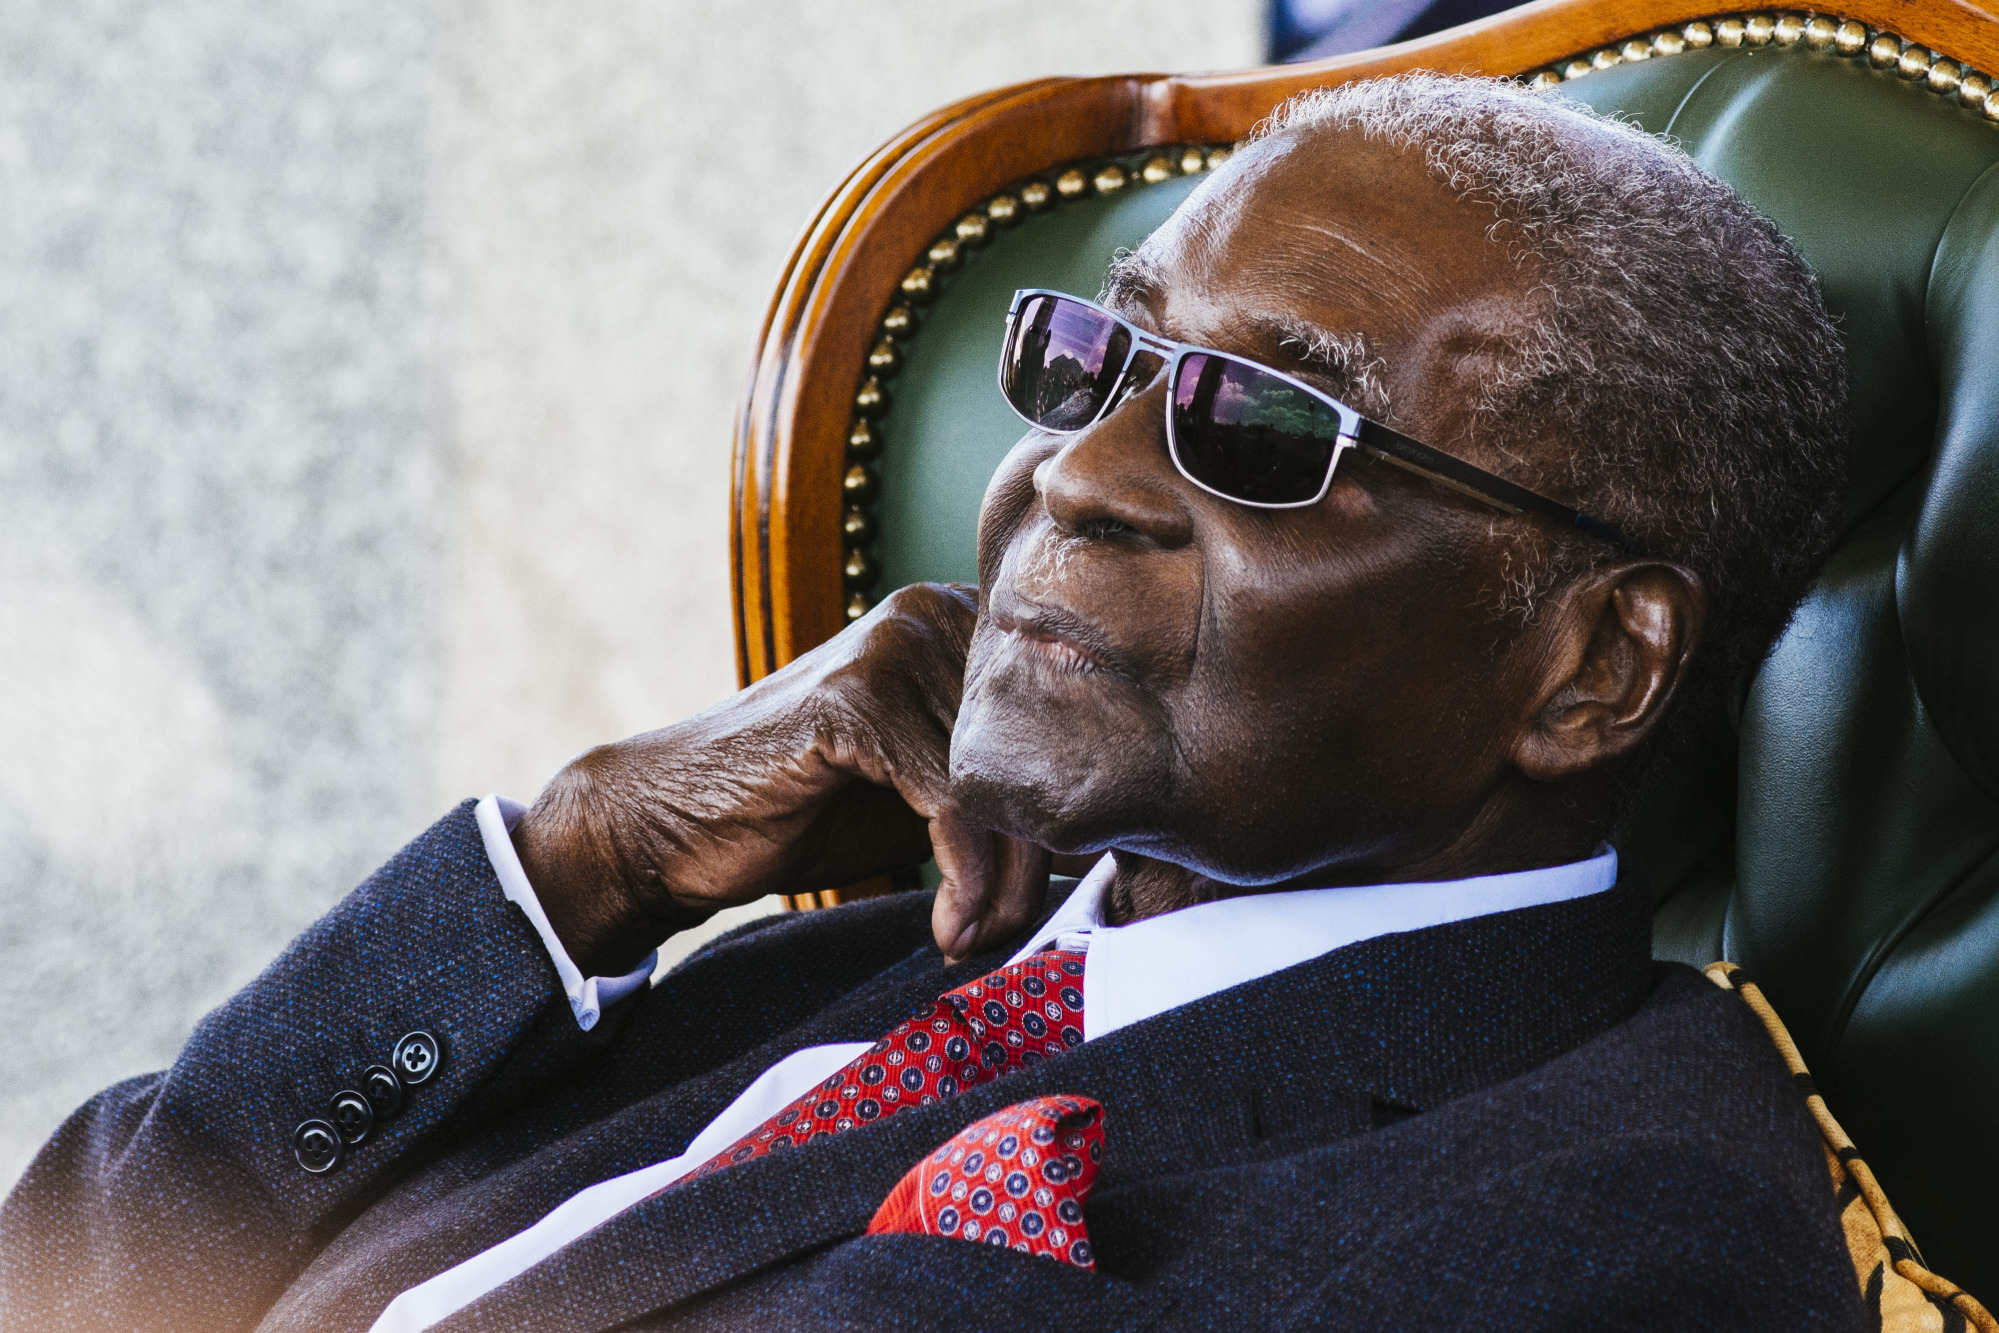 Former President Of Zimbabwe Robert Mugabe Speaks Ahead Of General Election